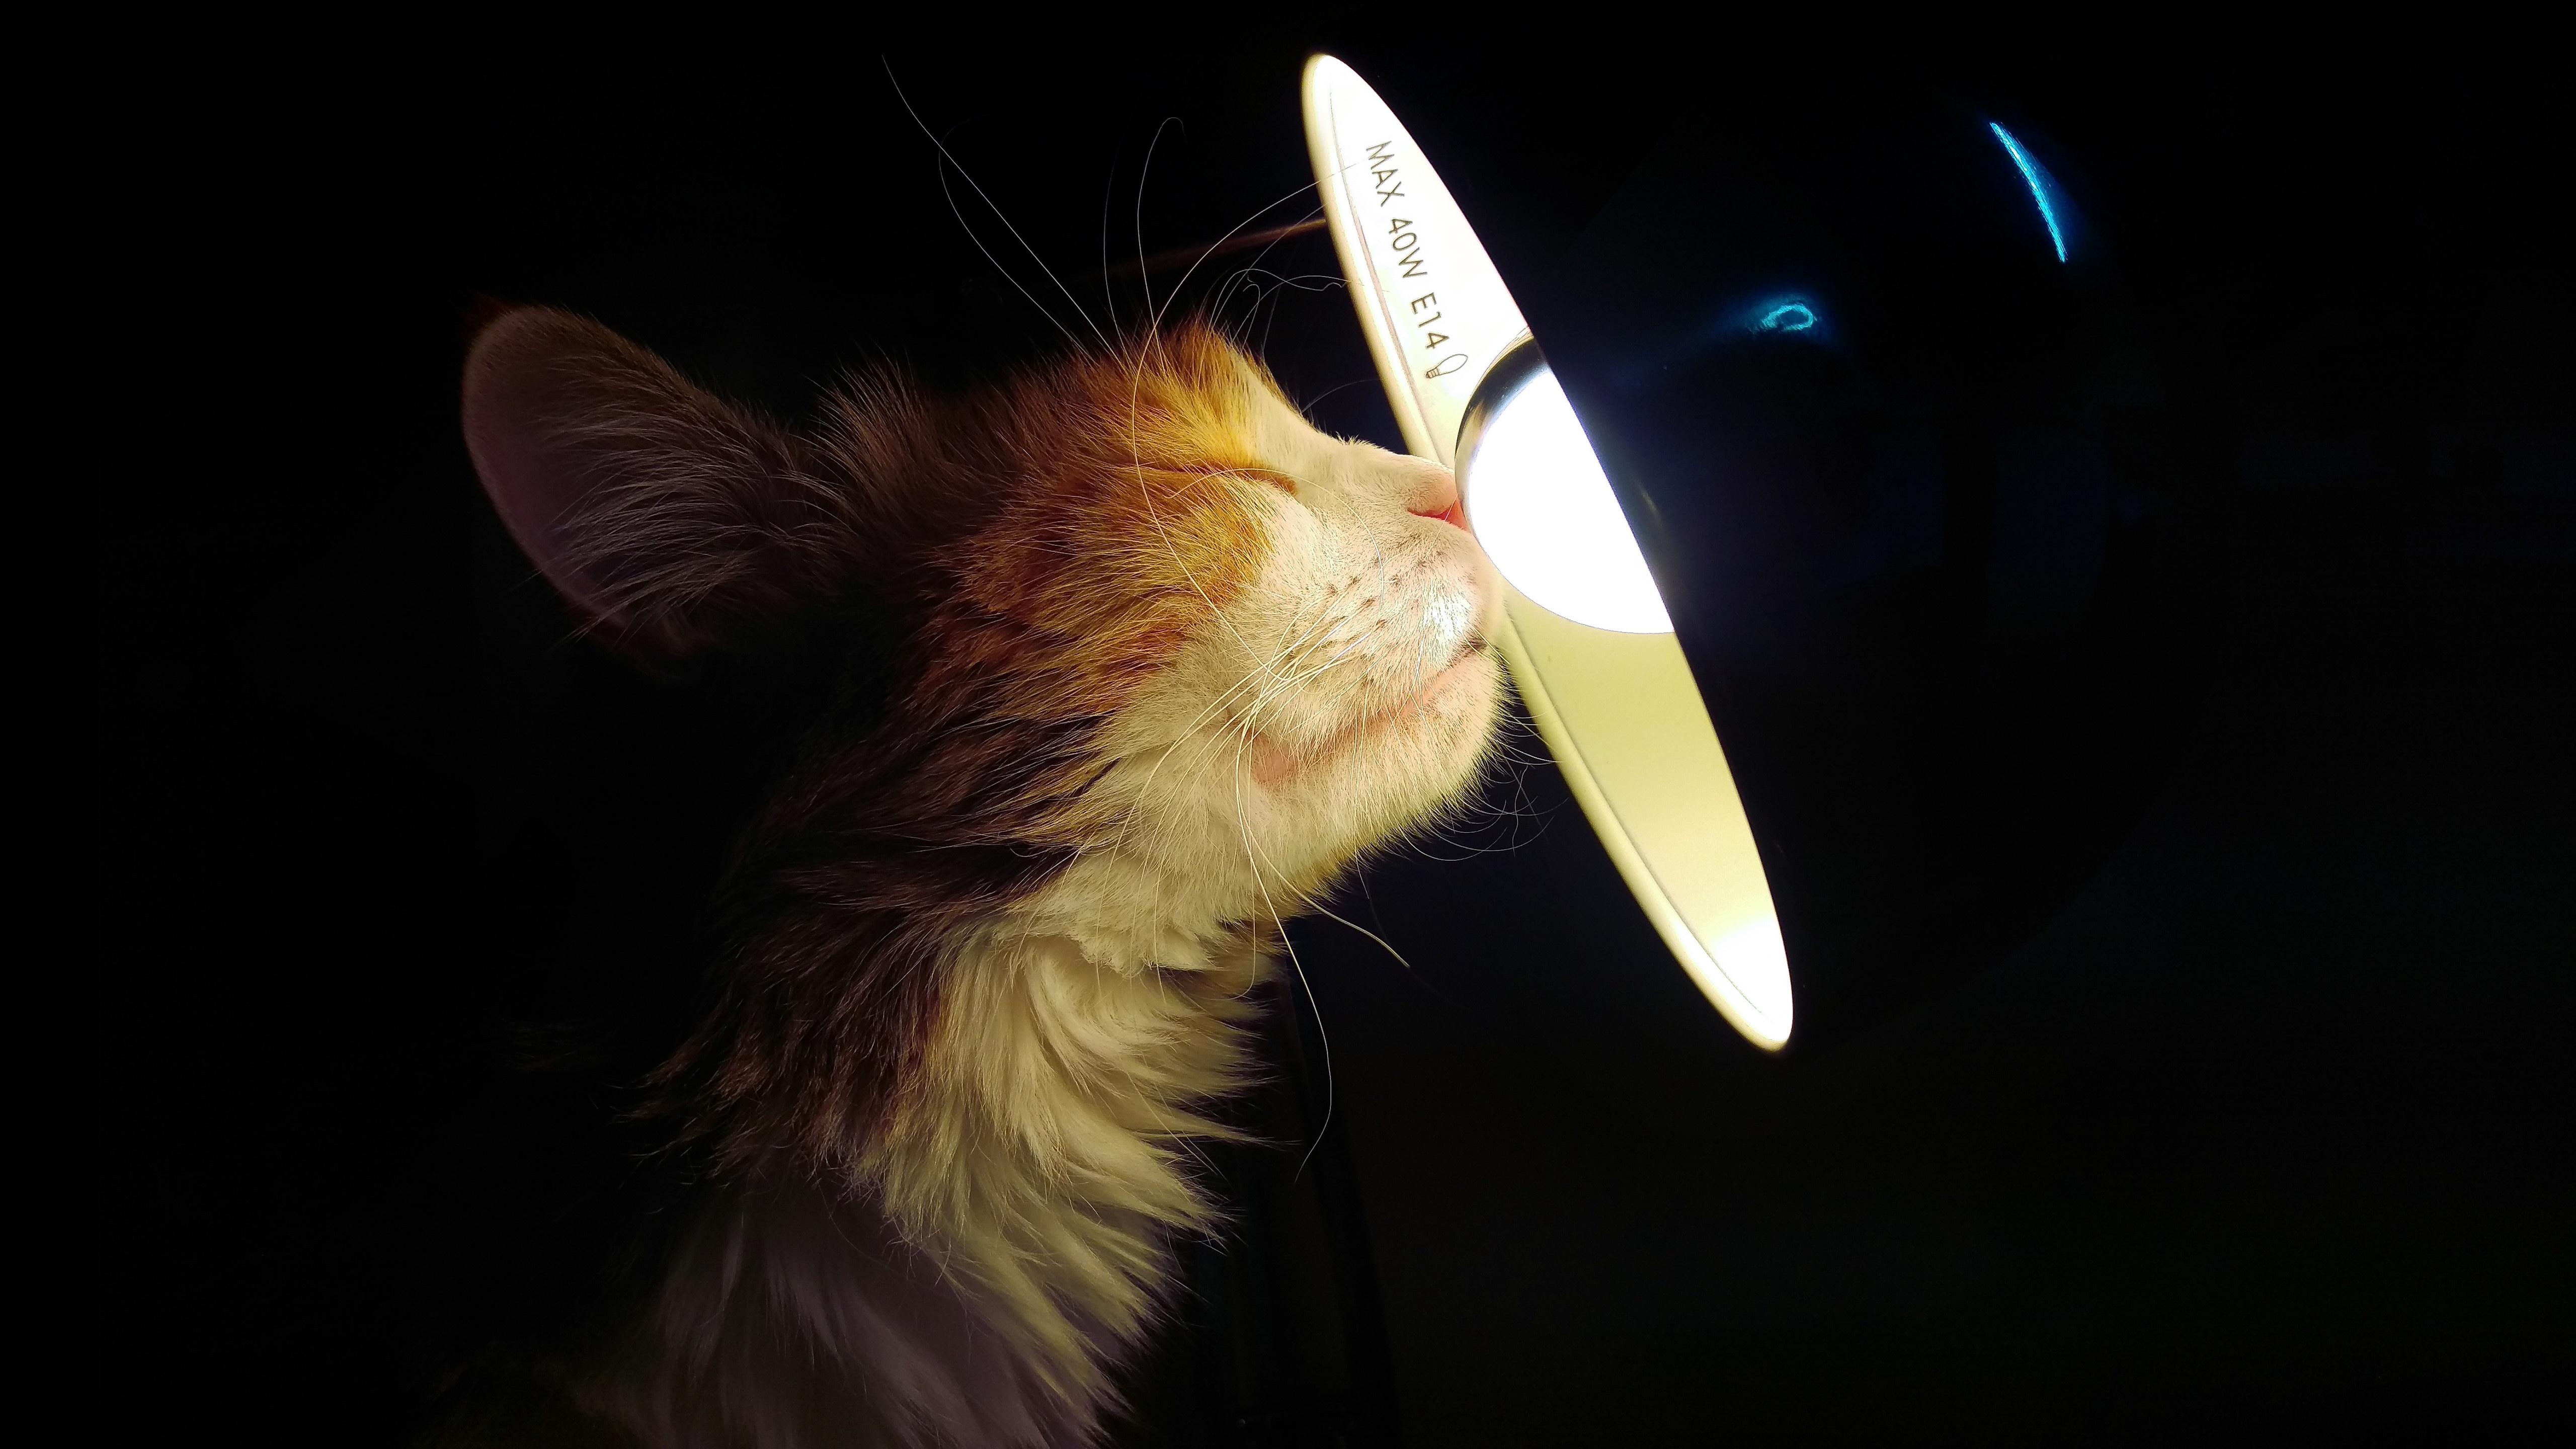 Фото кот лампа накаливания Лампа Морда Животные 5120x2880 коты кошка Кошки Лампочка ламп лампы морды животное